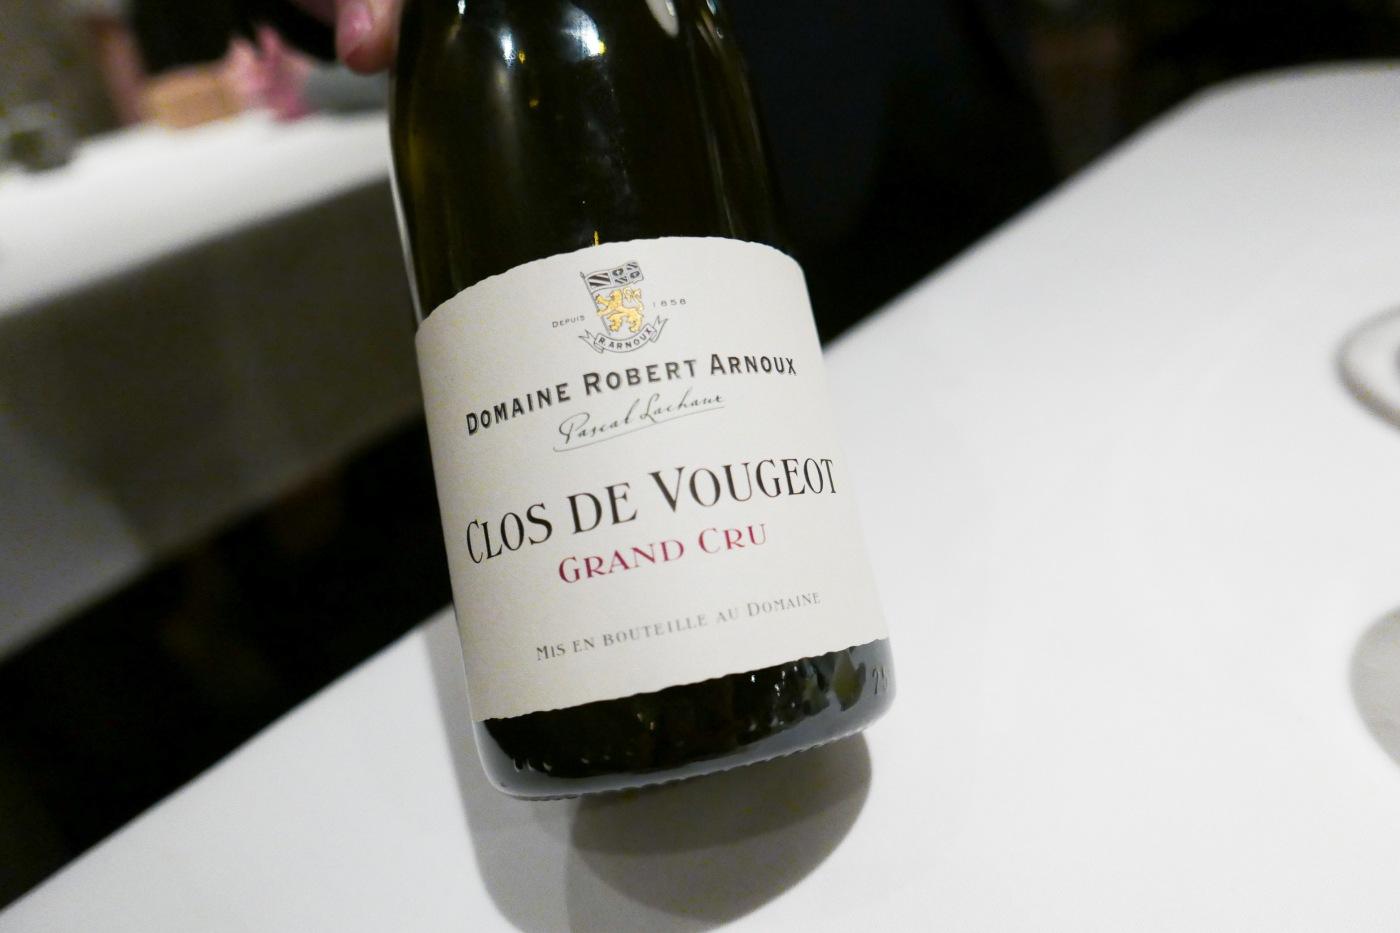 CLOS DE VOUGEOT Grand Cru, Domaine Robert Arnoux, Burgundy, France, 2002